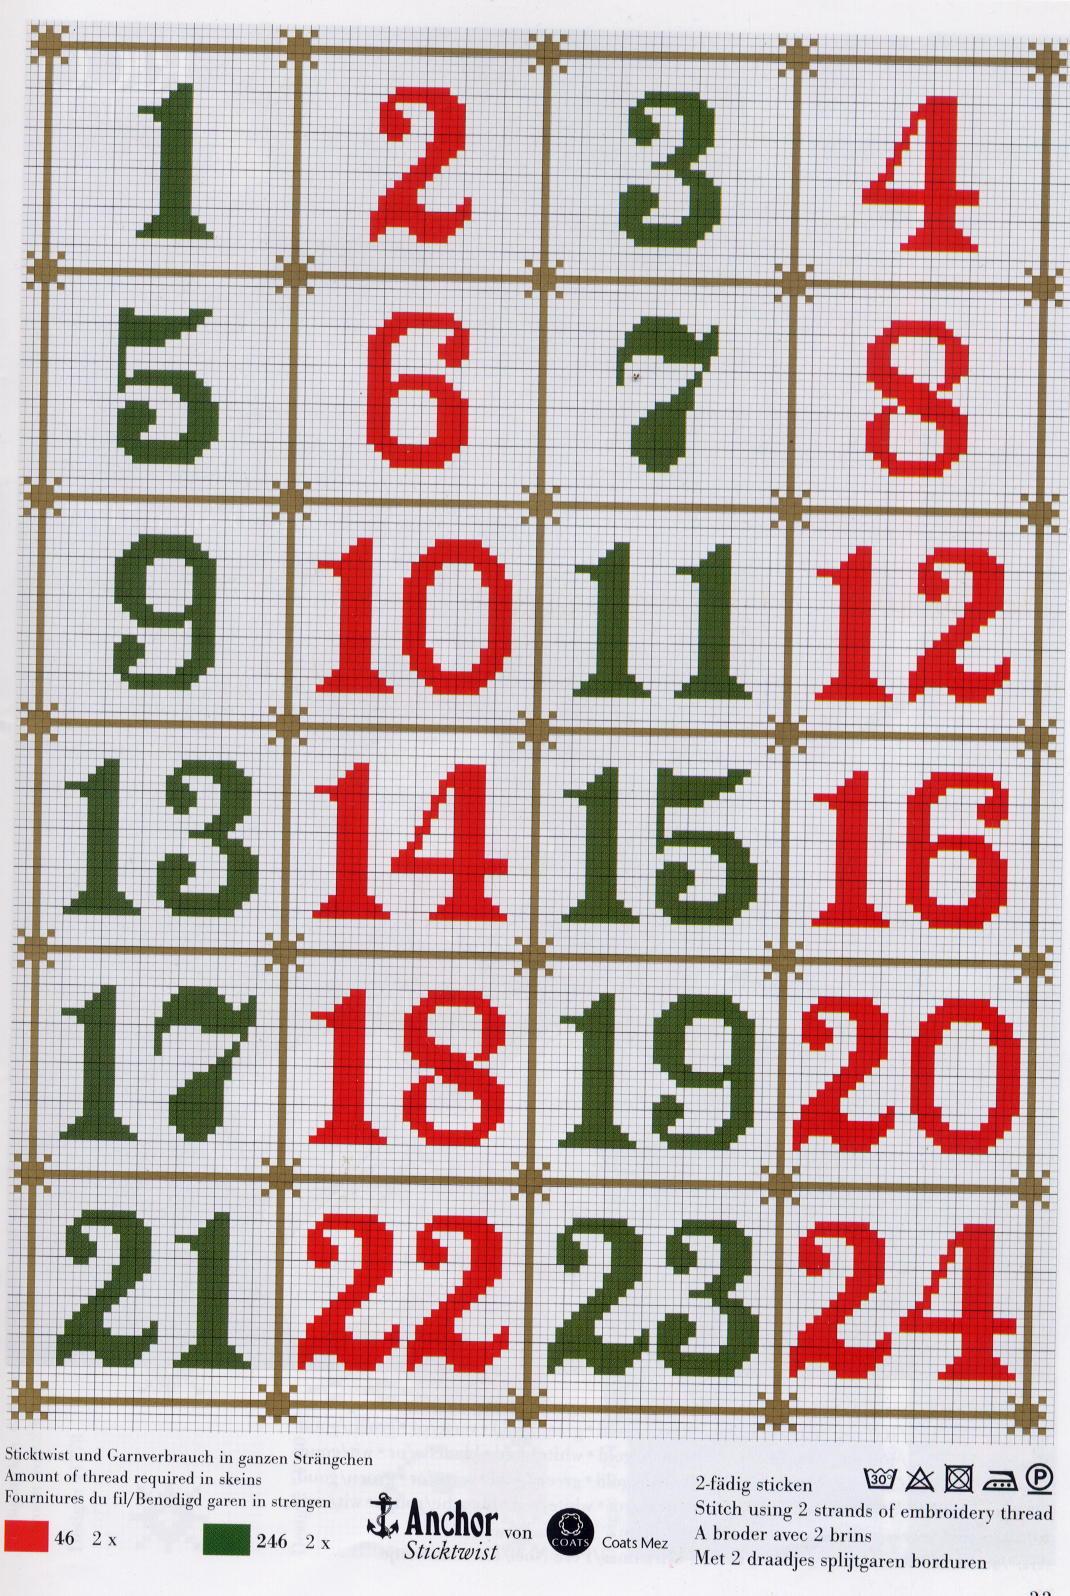 Calendario Dellavvento Punto Croce.Calendario Avvento Punto Croce Schemi Ikbenalles